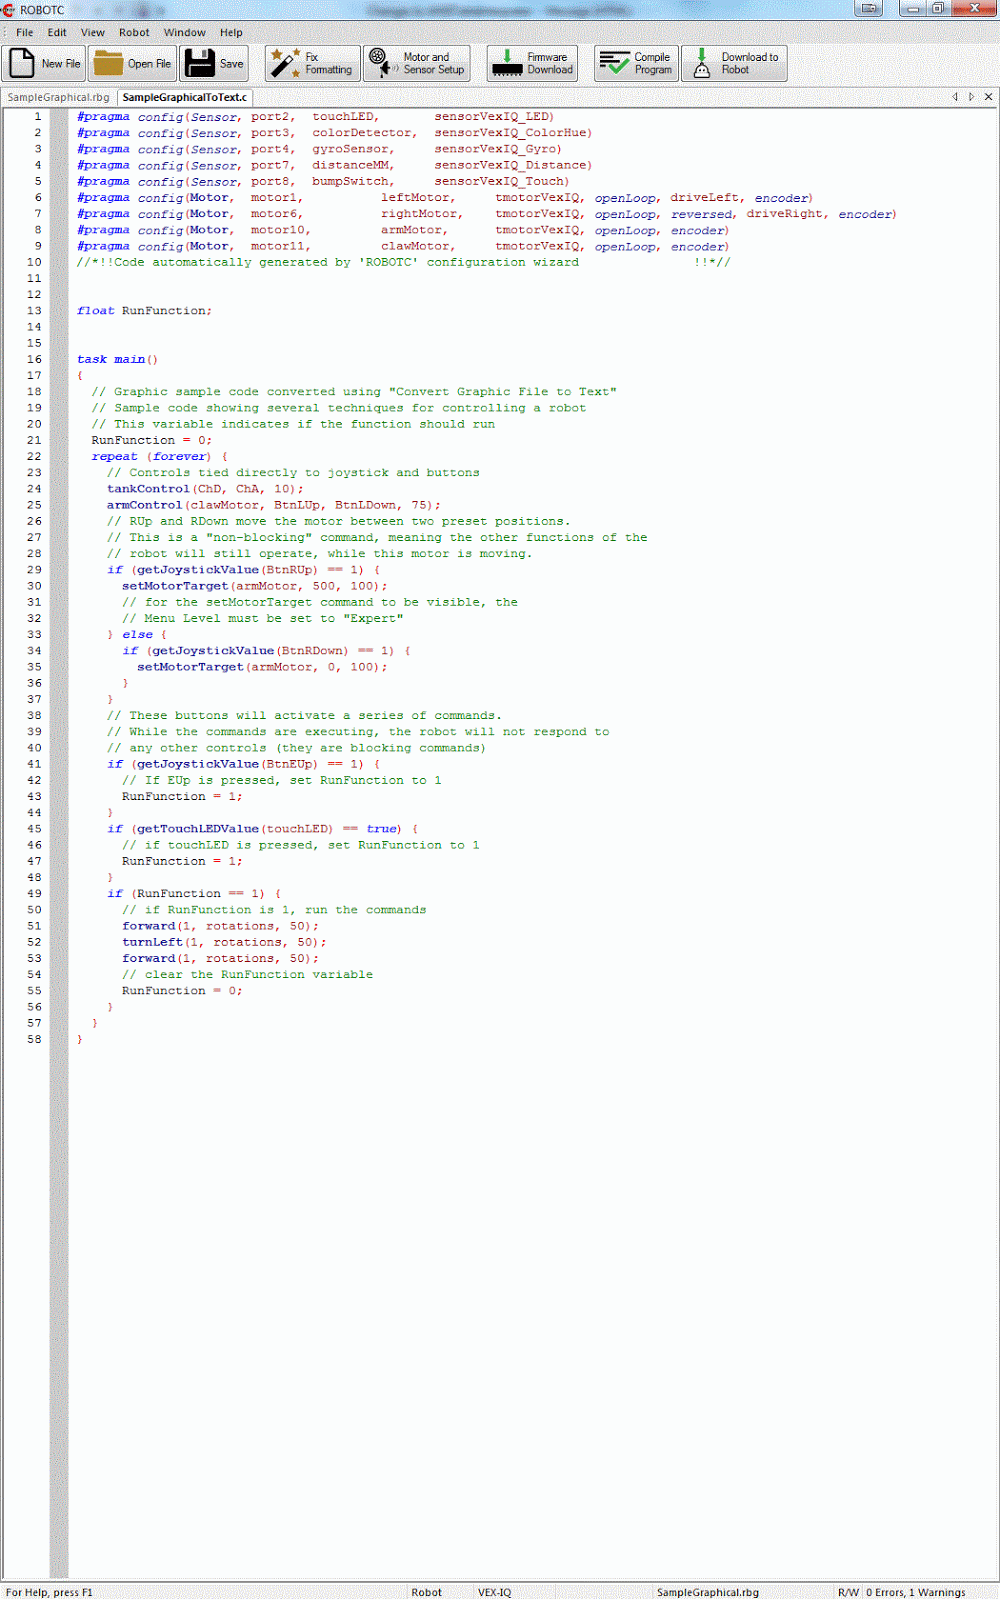 Building Robots: Sample RobotC code for VEX IQ